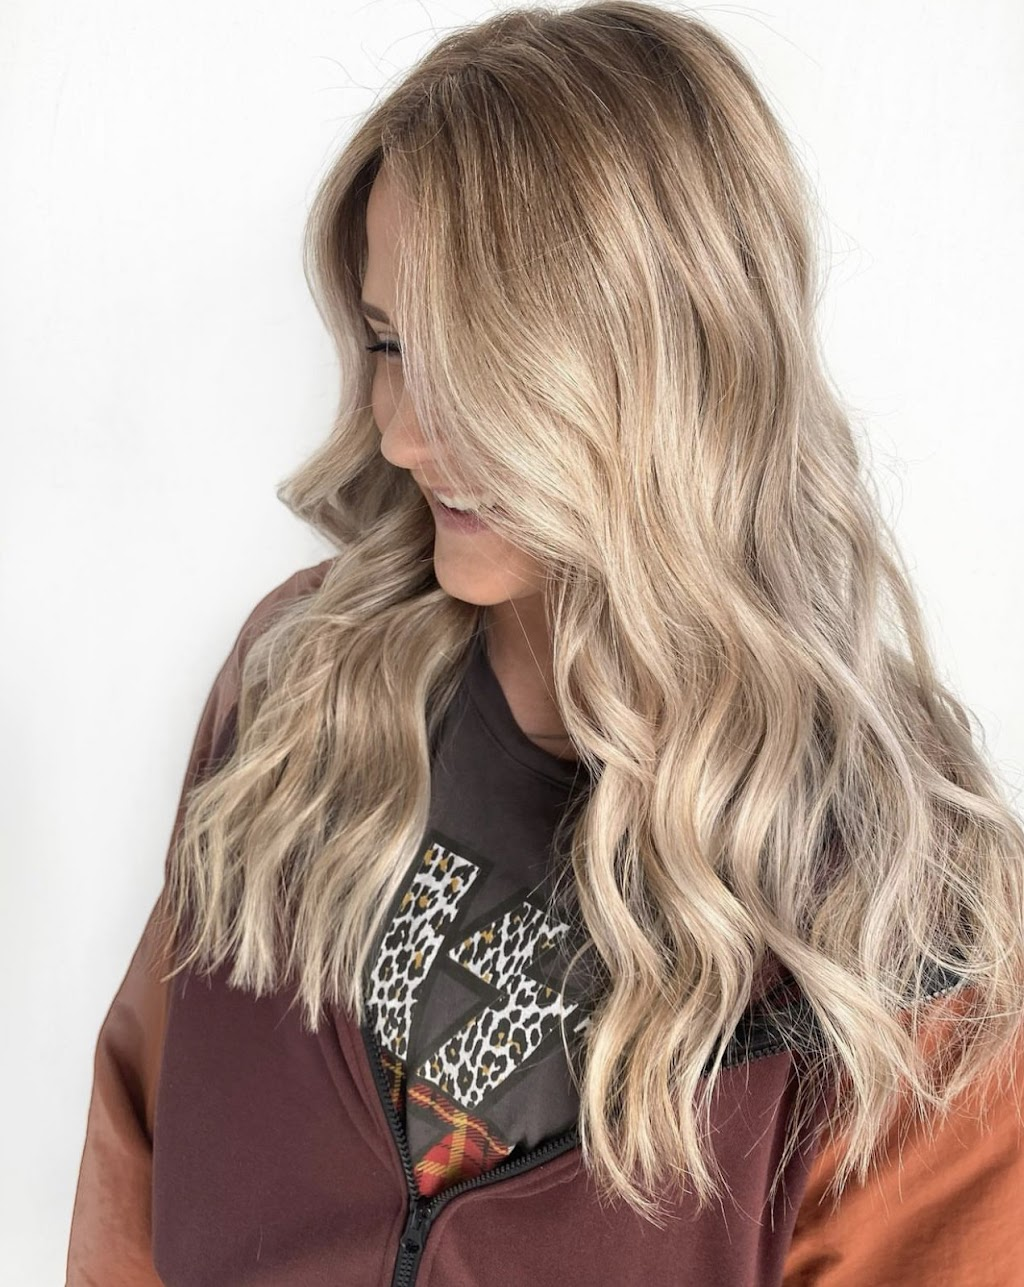 Evolve Simply Beauty - hair care    Photo 6 of 10   Address: 4590 N Maize Rd #8, Maize, KS 67101, USA   Phone: (316) 927-2400